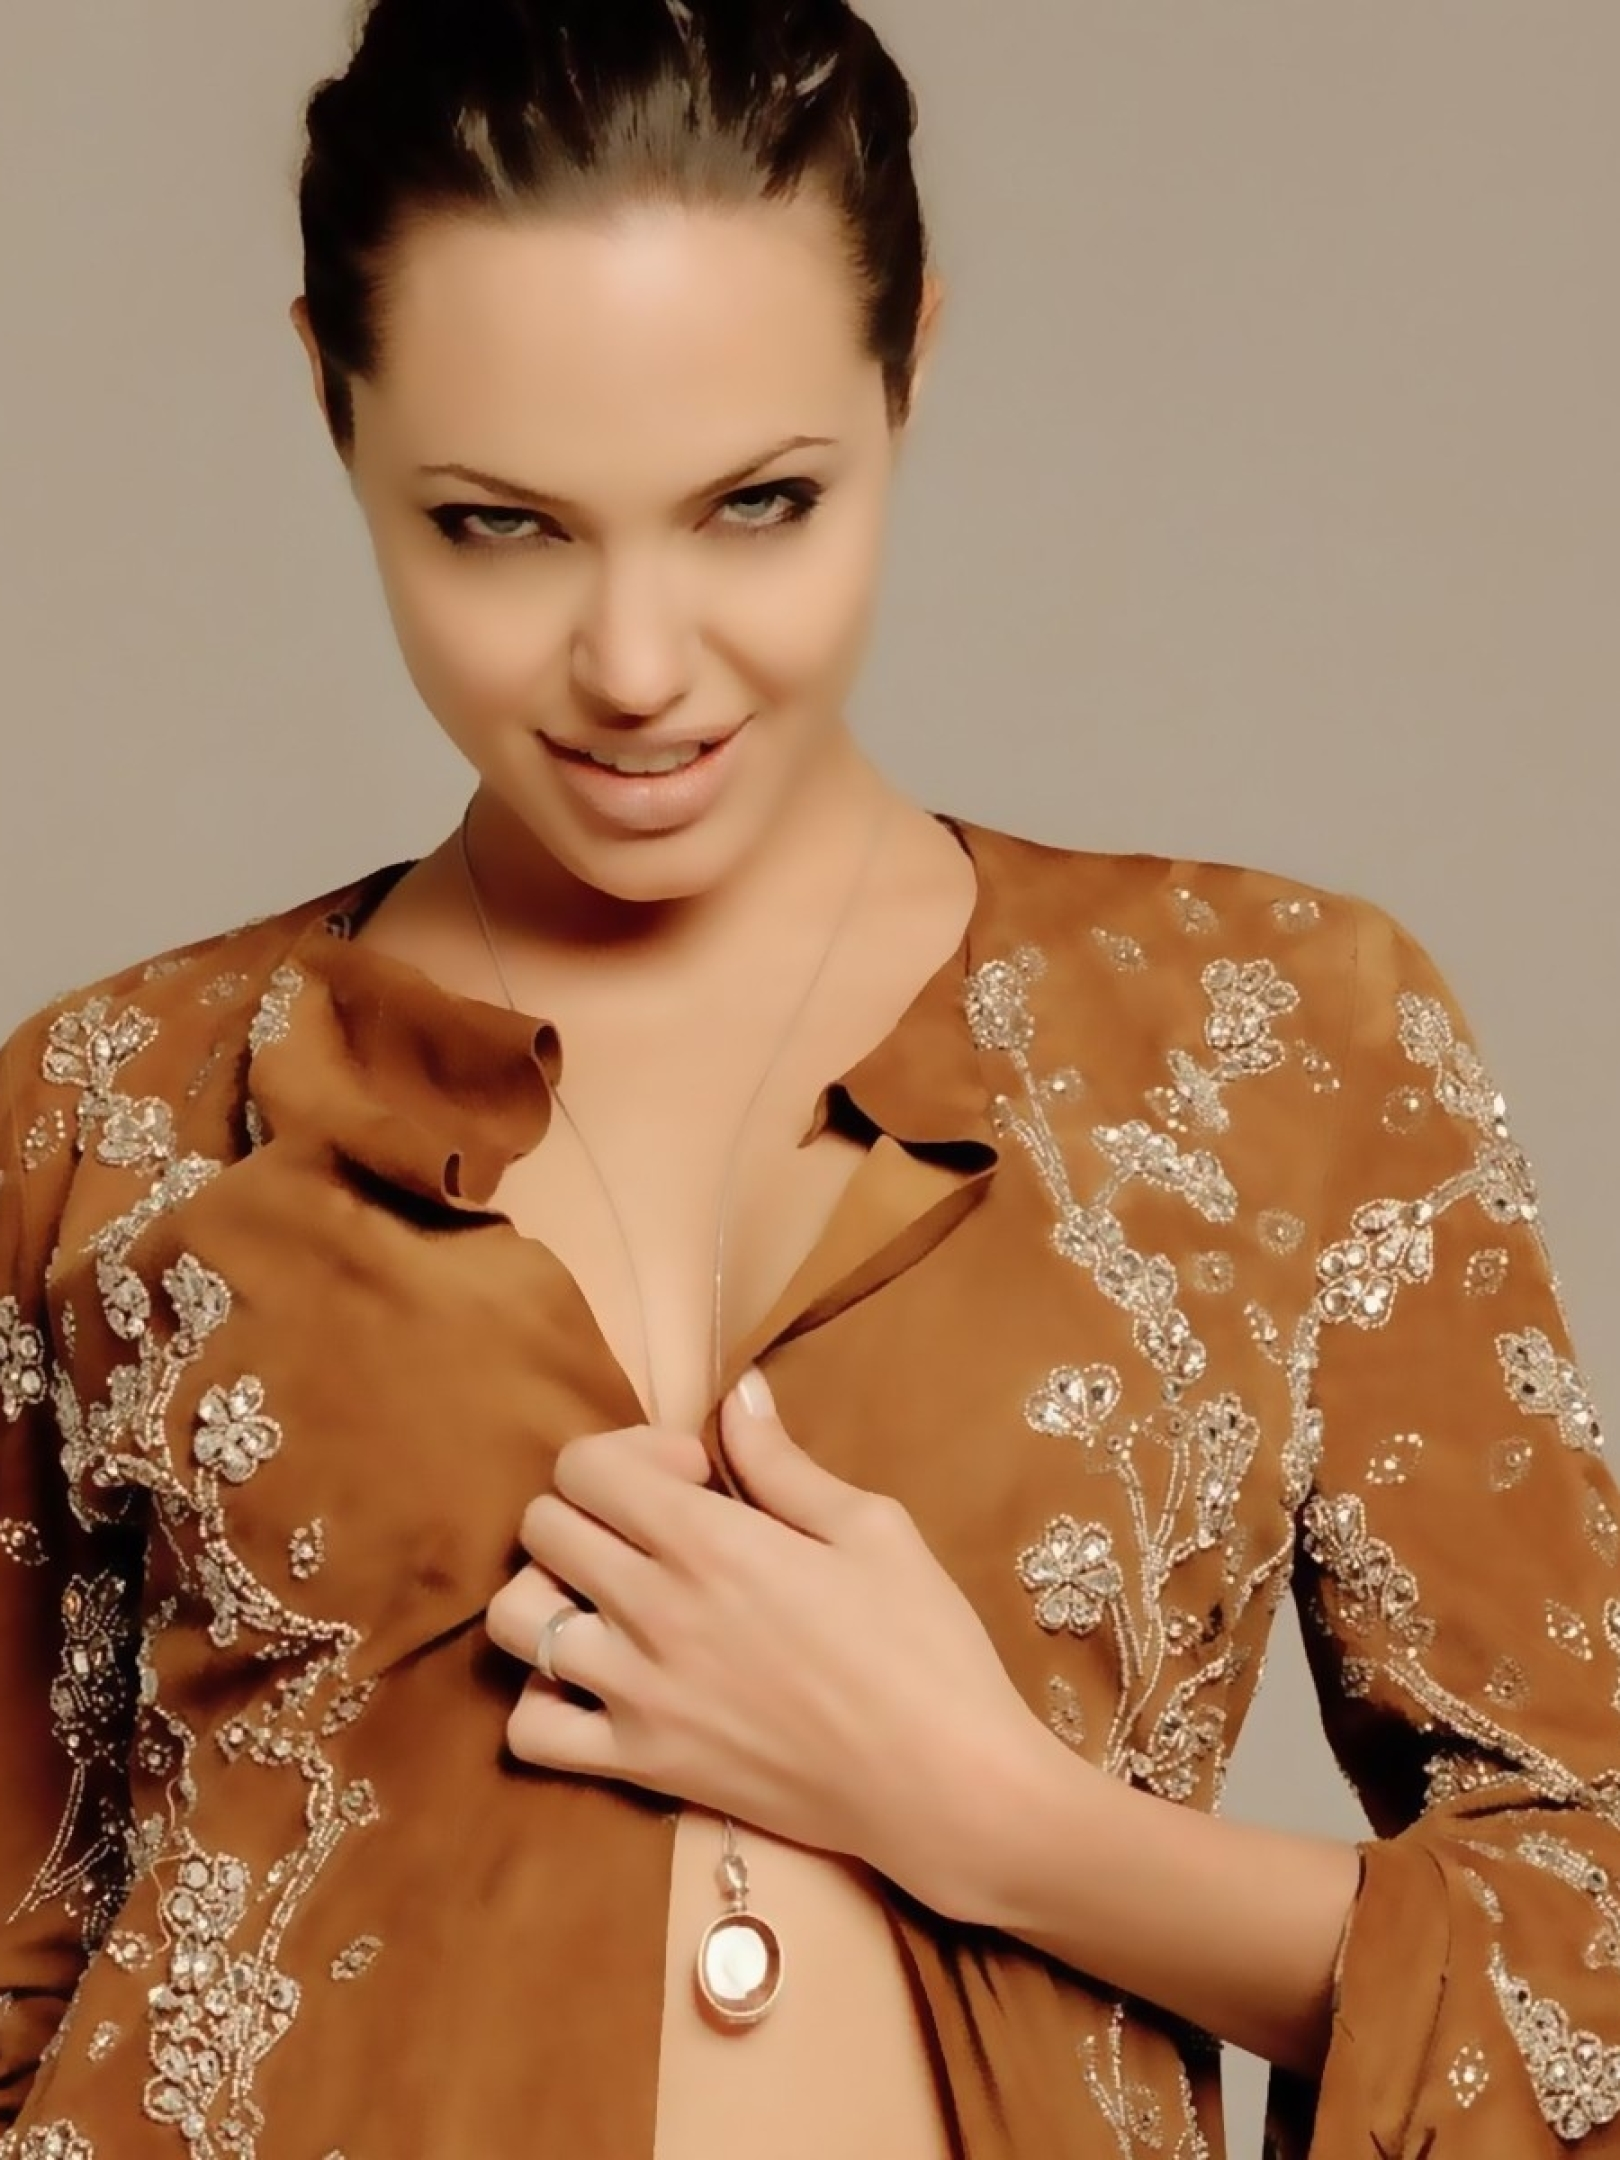 Angelina Jolie Sexi Movie 1620x2160 angelina jolie sexy photoshoot 1620x2160